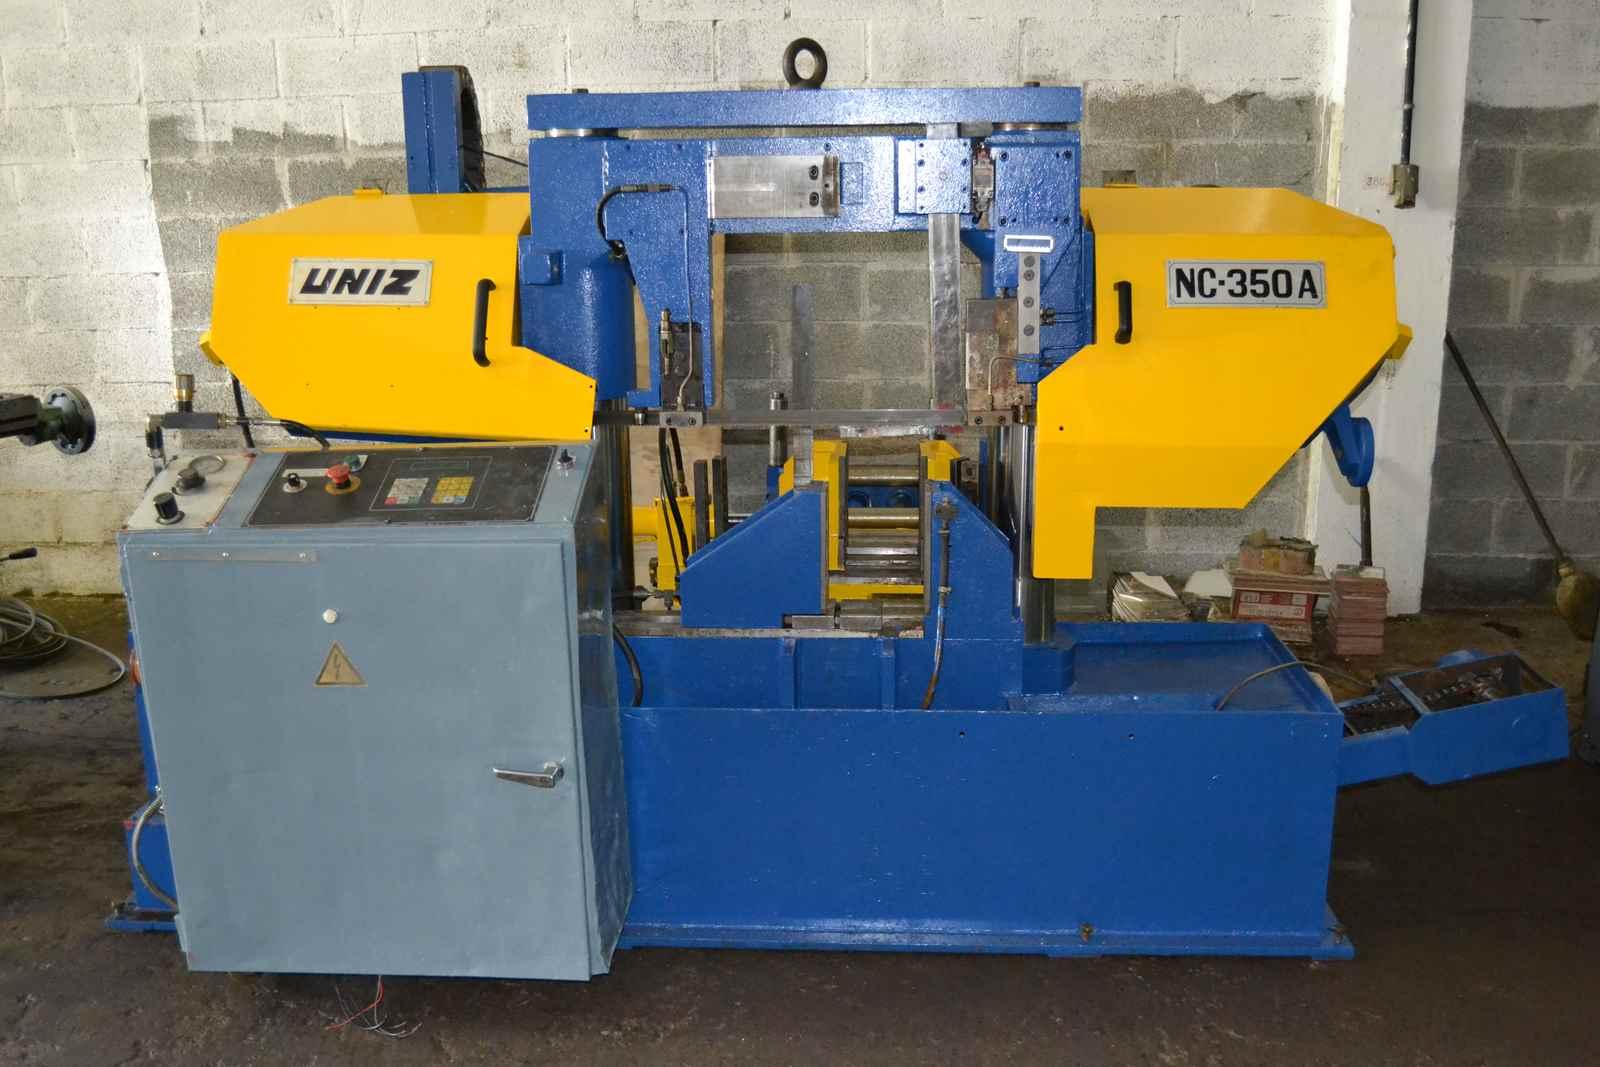 Sierra de cinta automatica UNIZ NC350A